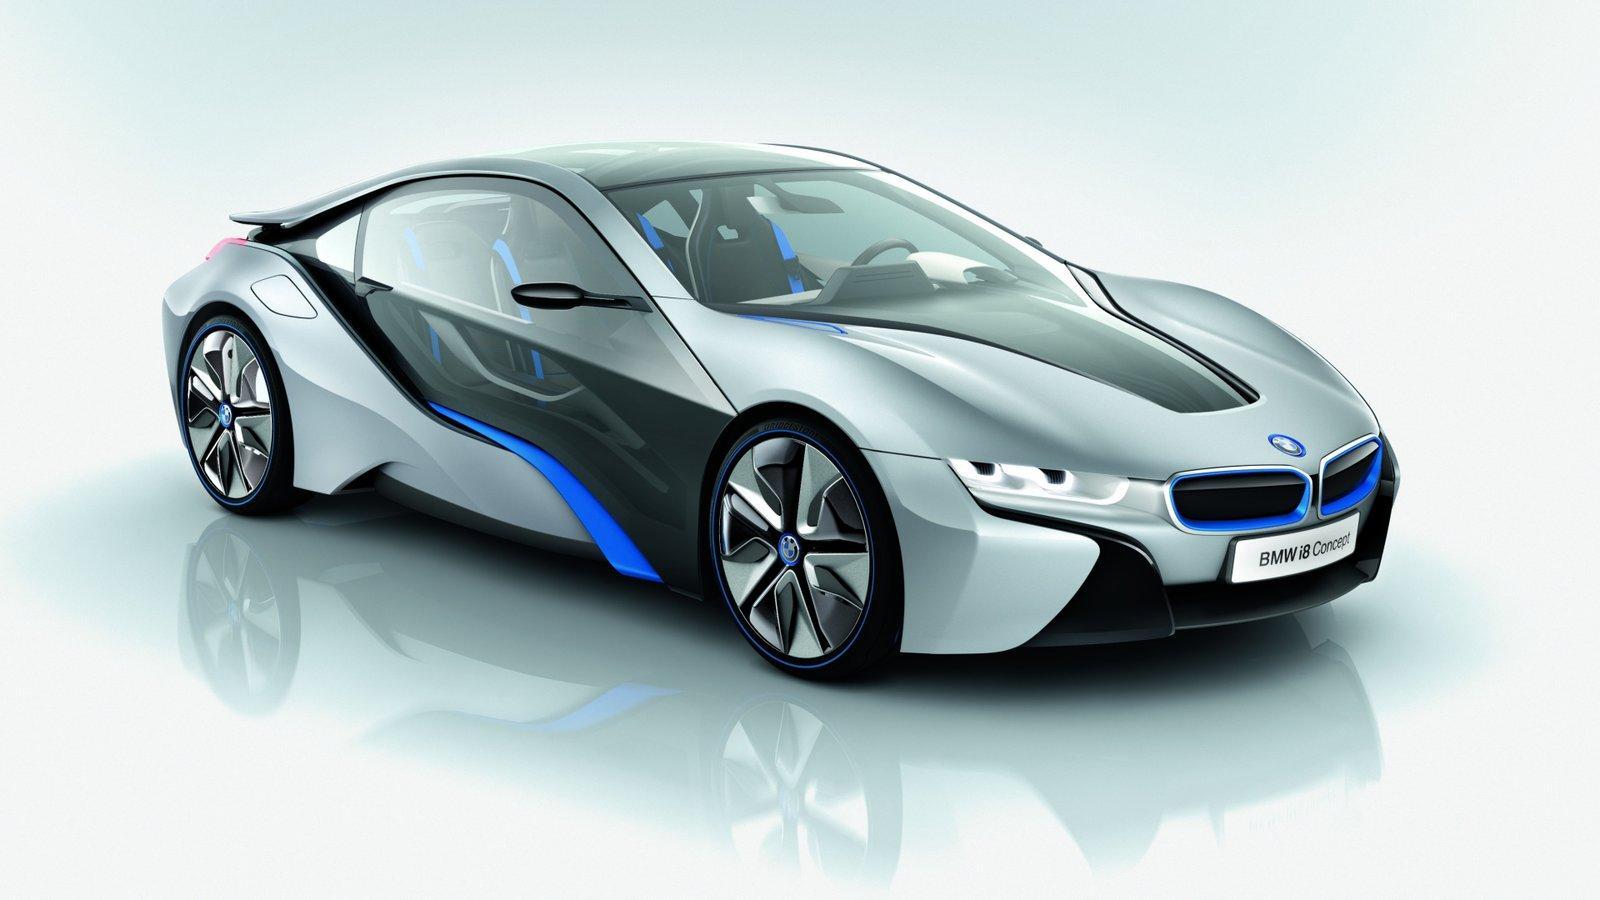 Bmw I8 Hybrid Showcase In India At Delhi Auto Expo 2014 India On Roads